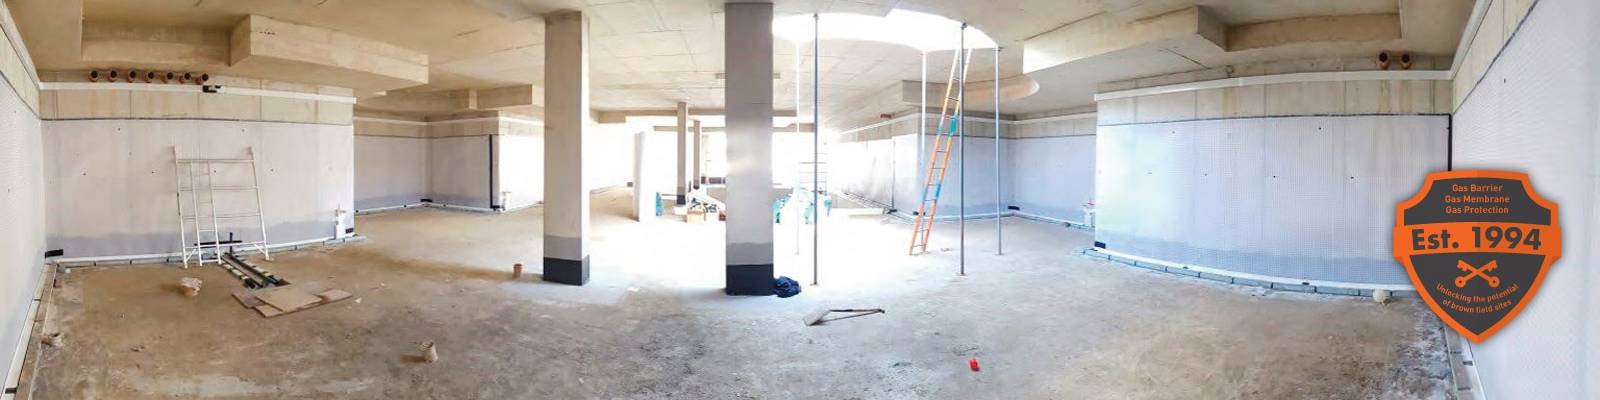 basement-waterproofing.jpg